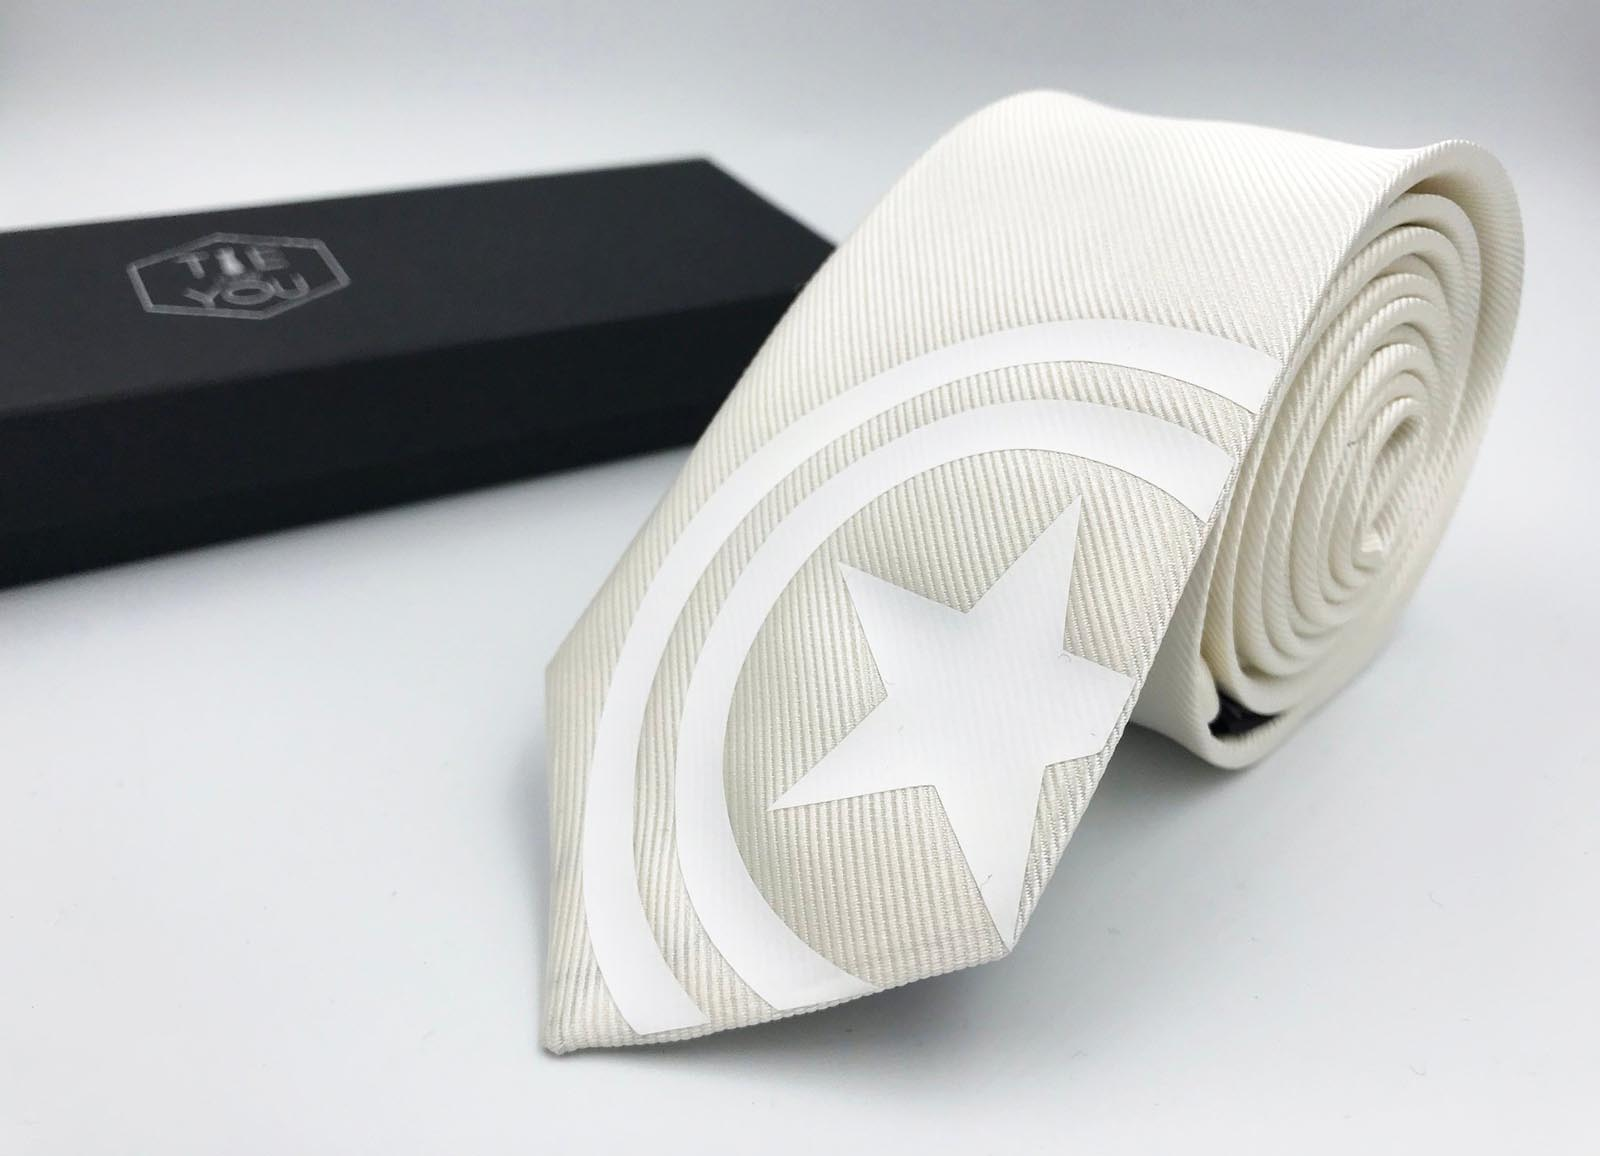 Wedding Tie Slim Tie Captain America Silk Tie Black Edition Avengers